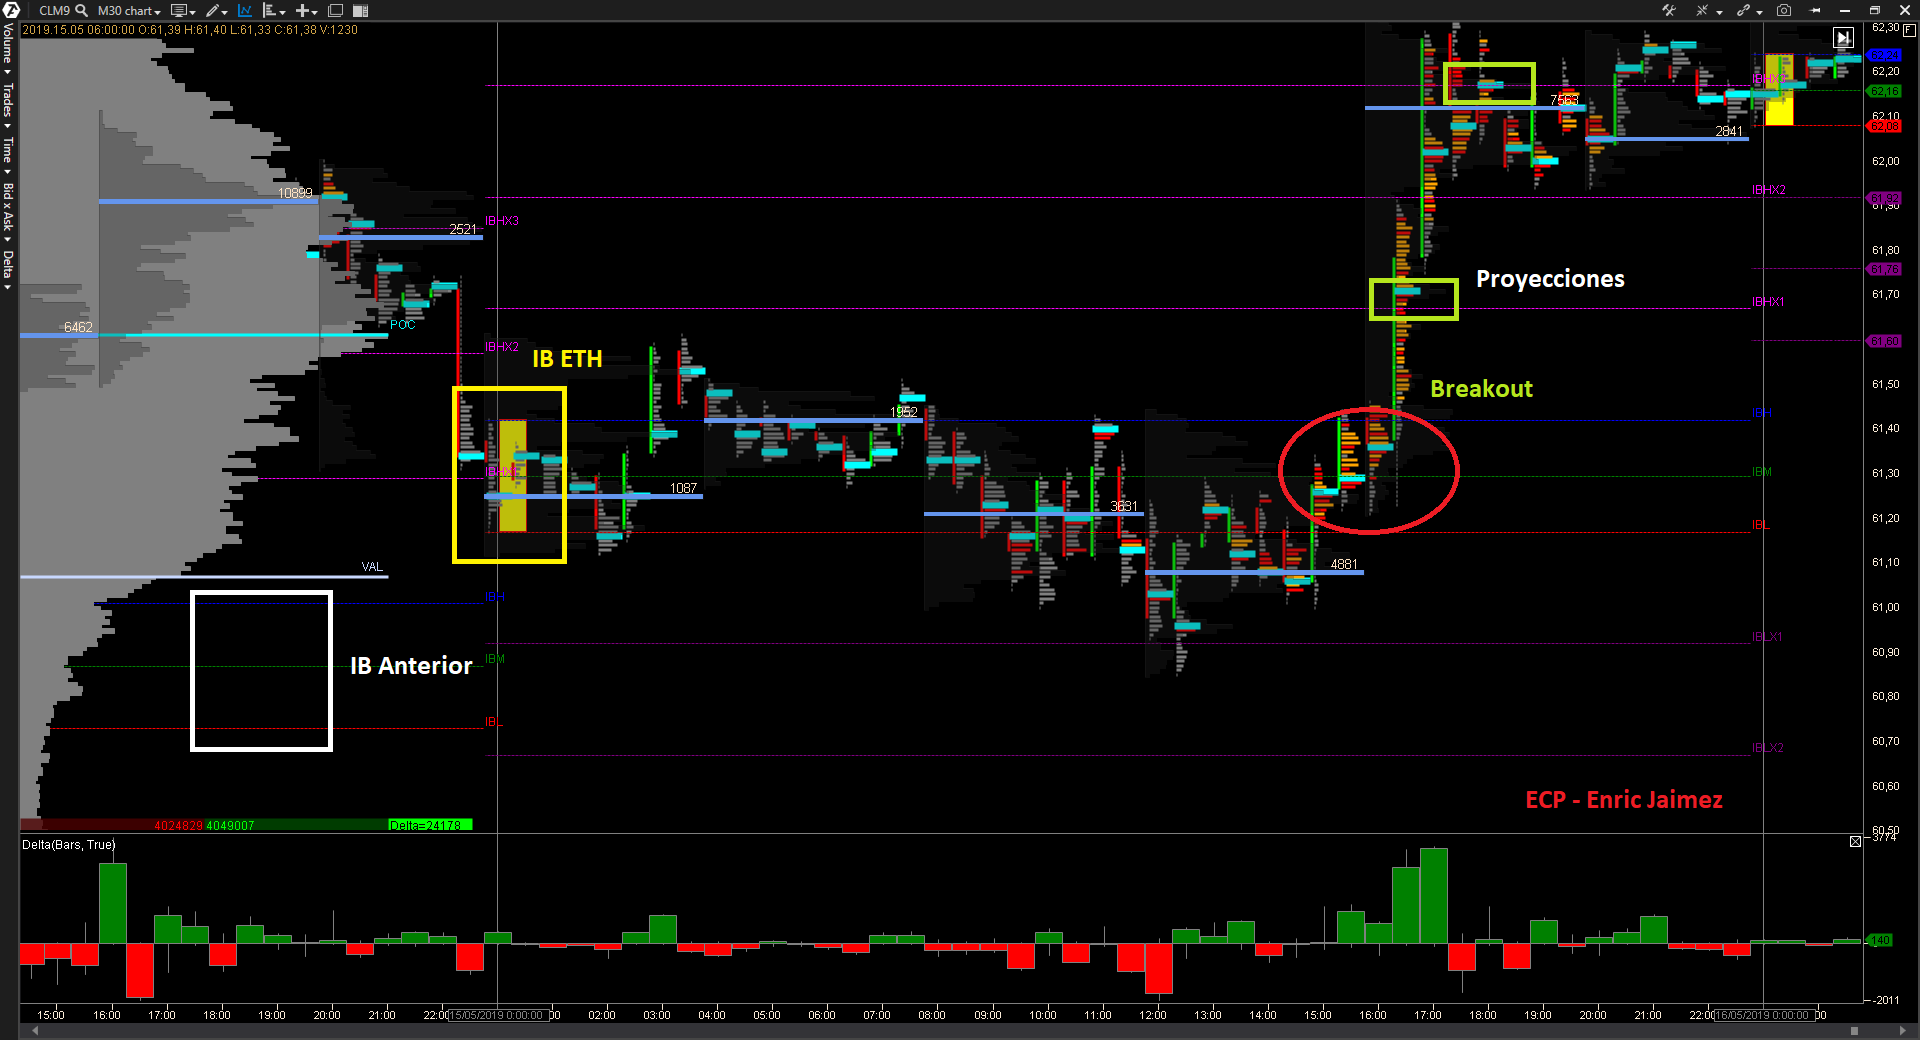 Market Profile Trading [Segunda parte] - Initial Balance - Enric Jaimez